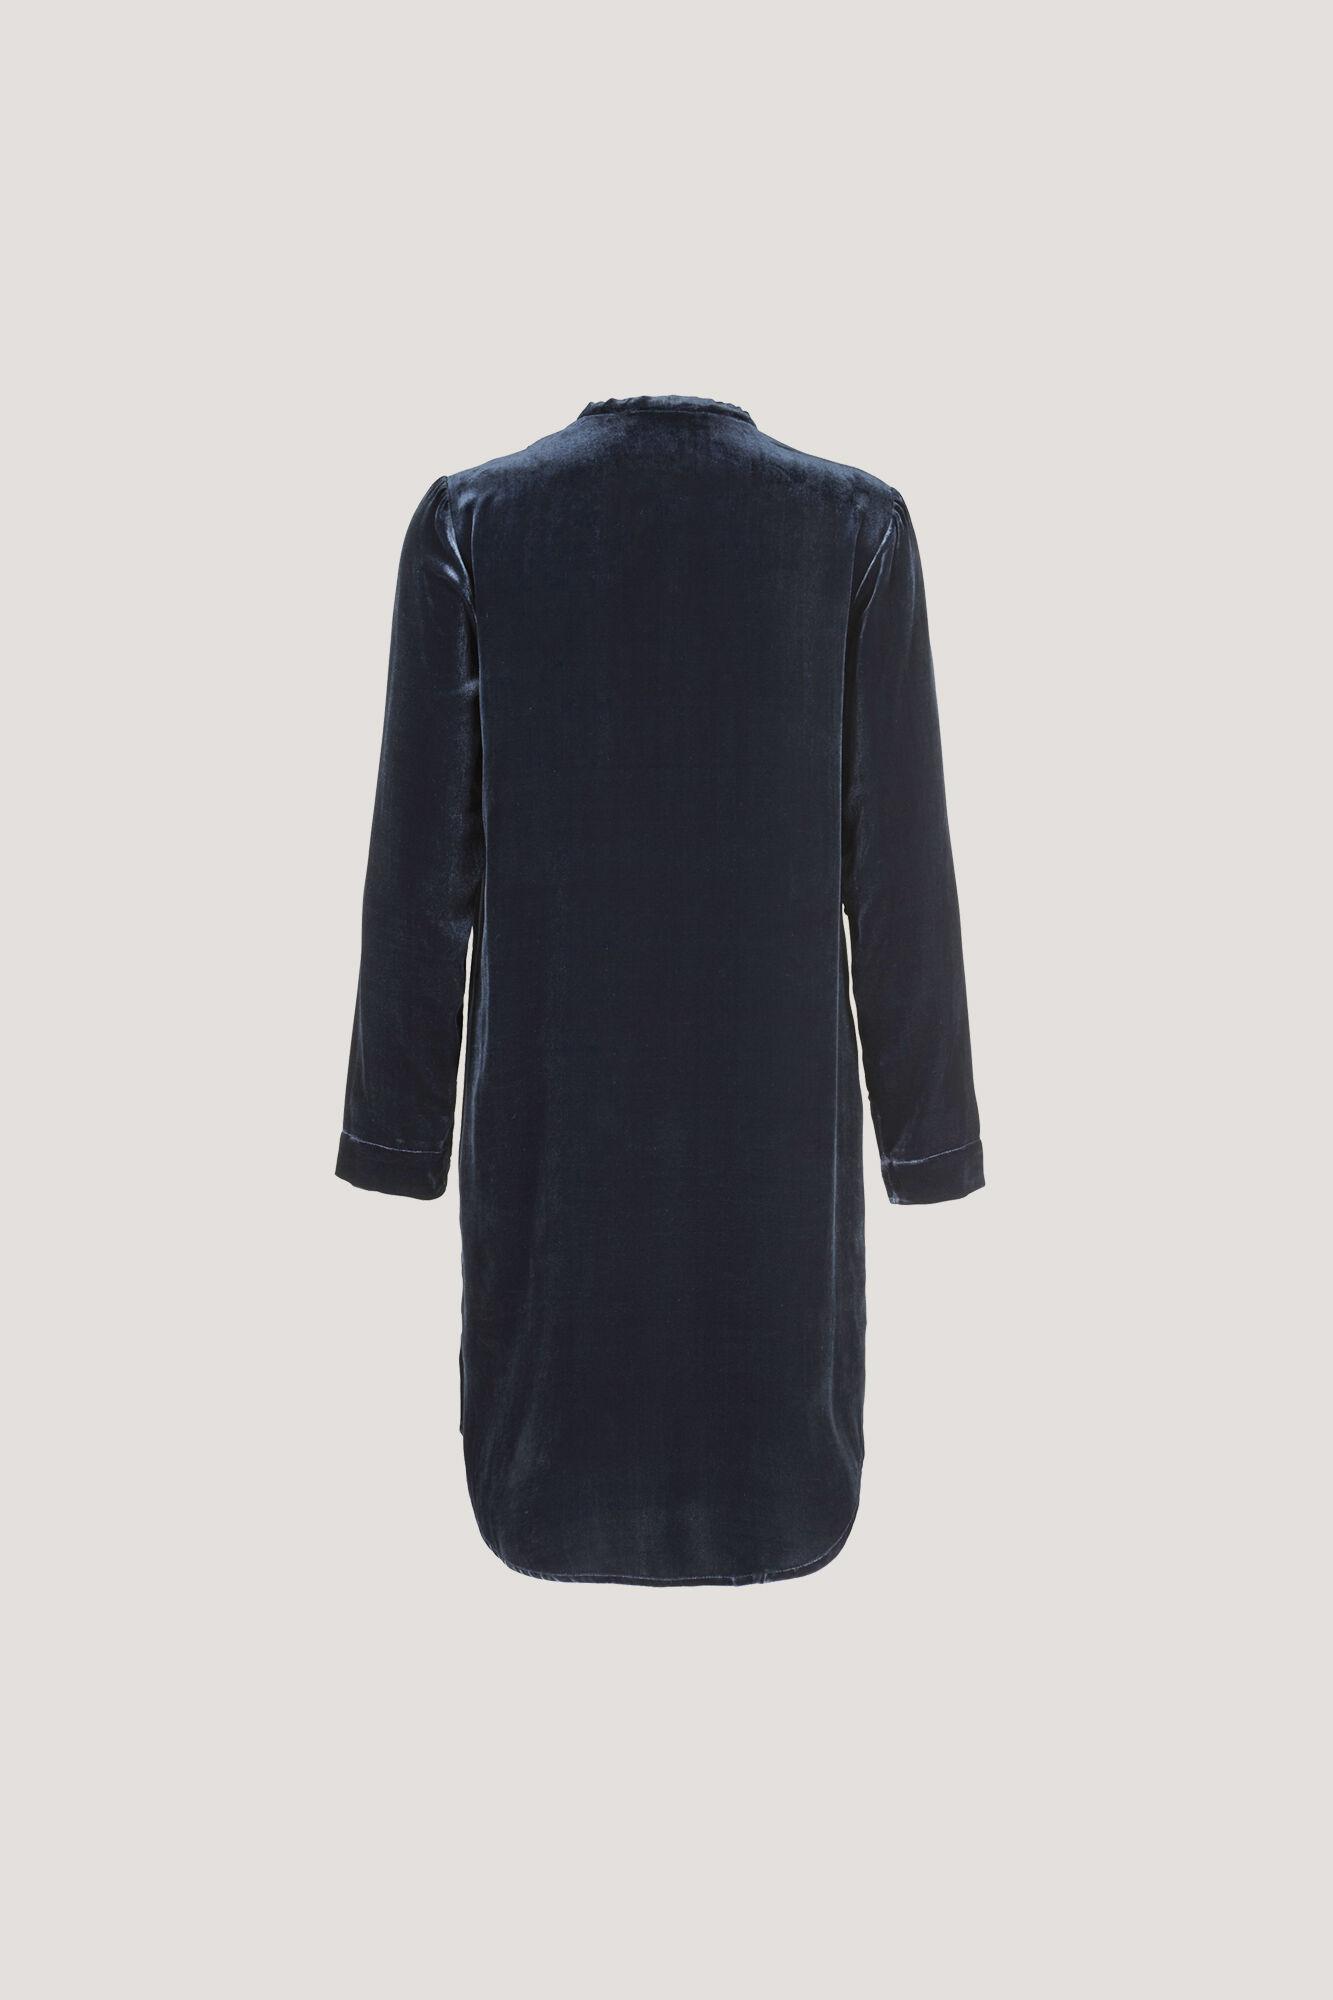 Bjelke shirt 6627